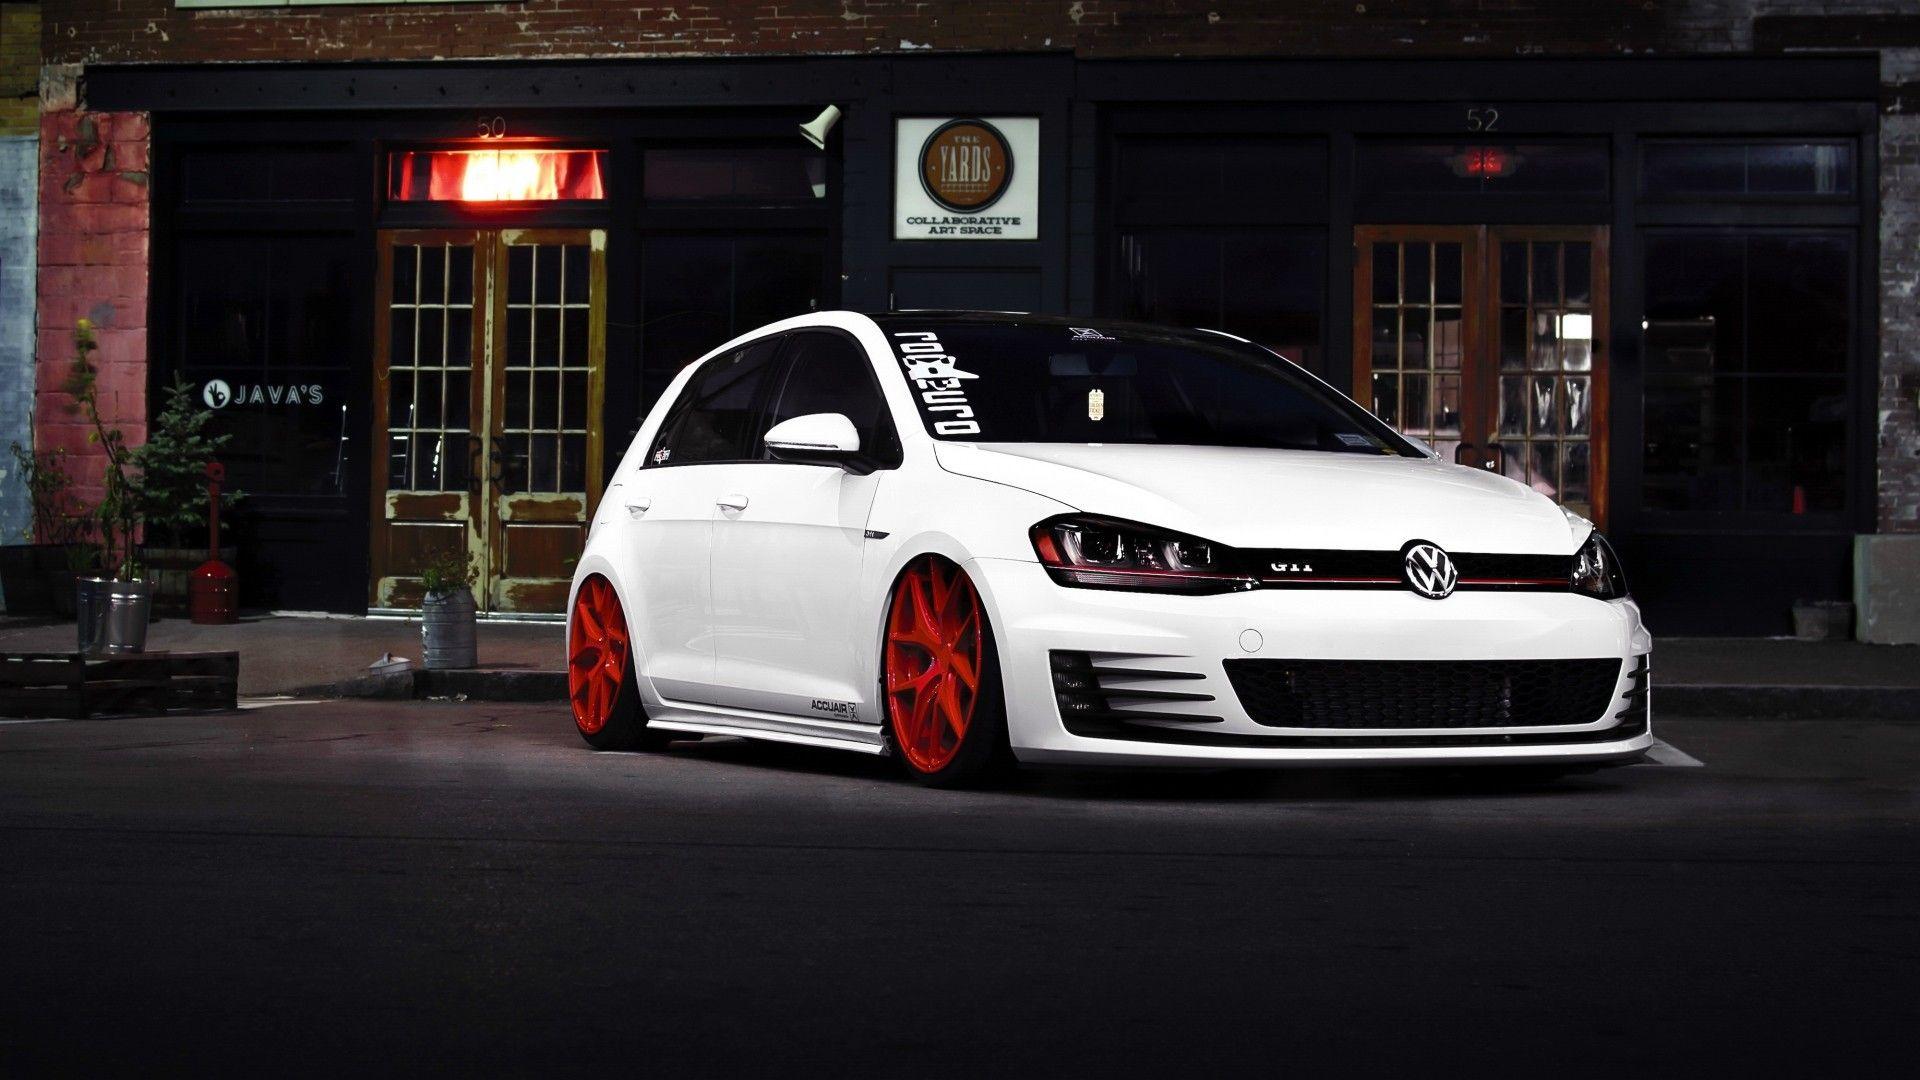 67 Mk7 Gti Wallpapers On Wallpaperplay In 2020 Volkswagen Golf Gti Volkswagen Golf Golf Gti